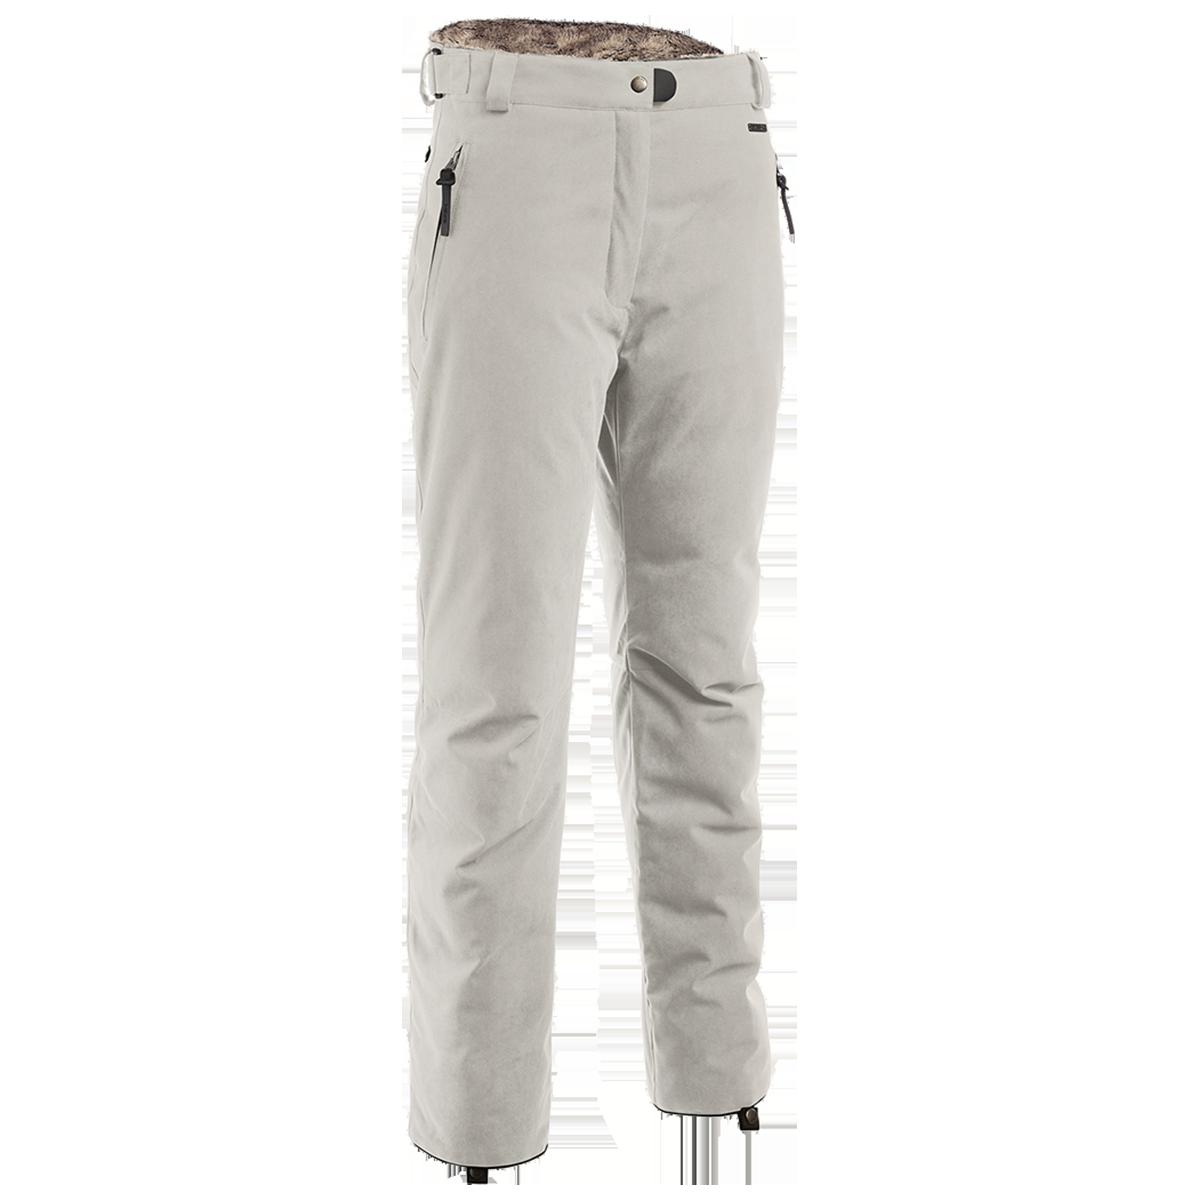 Пуховые брюки BASK MANARAGA фото